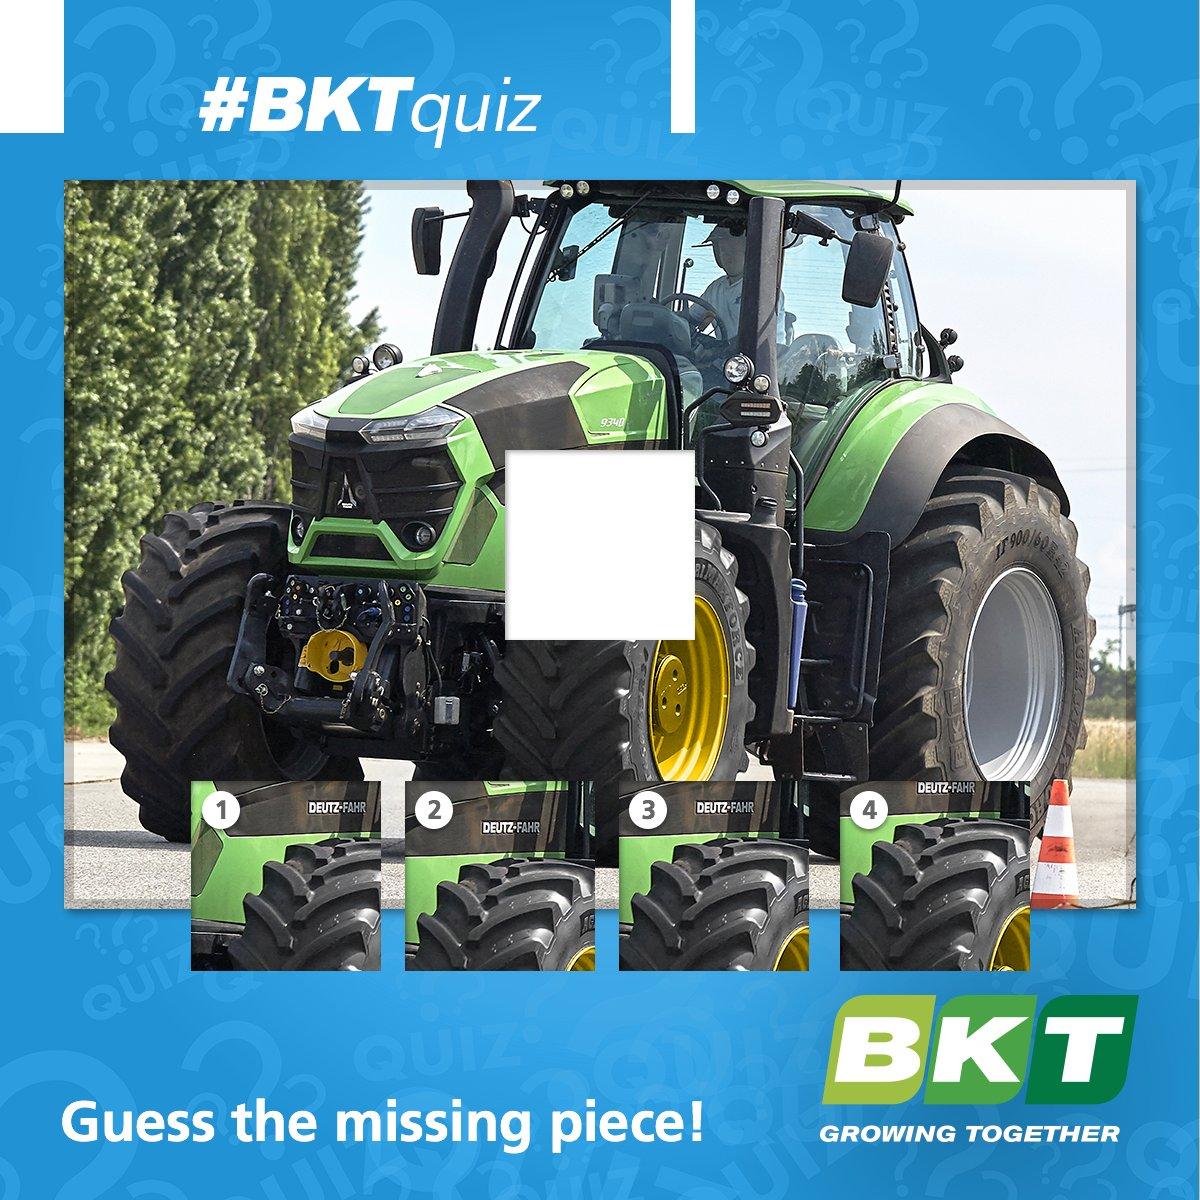 Choose the right piece to complete this picture! #BKTquiz #quiz #puzzles https://t.co/moNoRVXH18